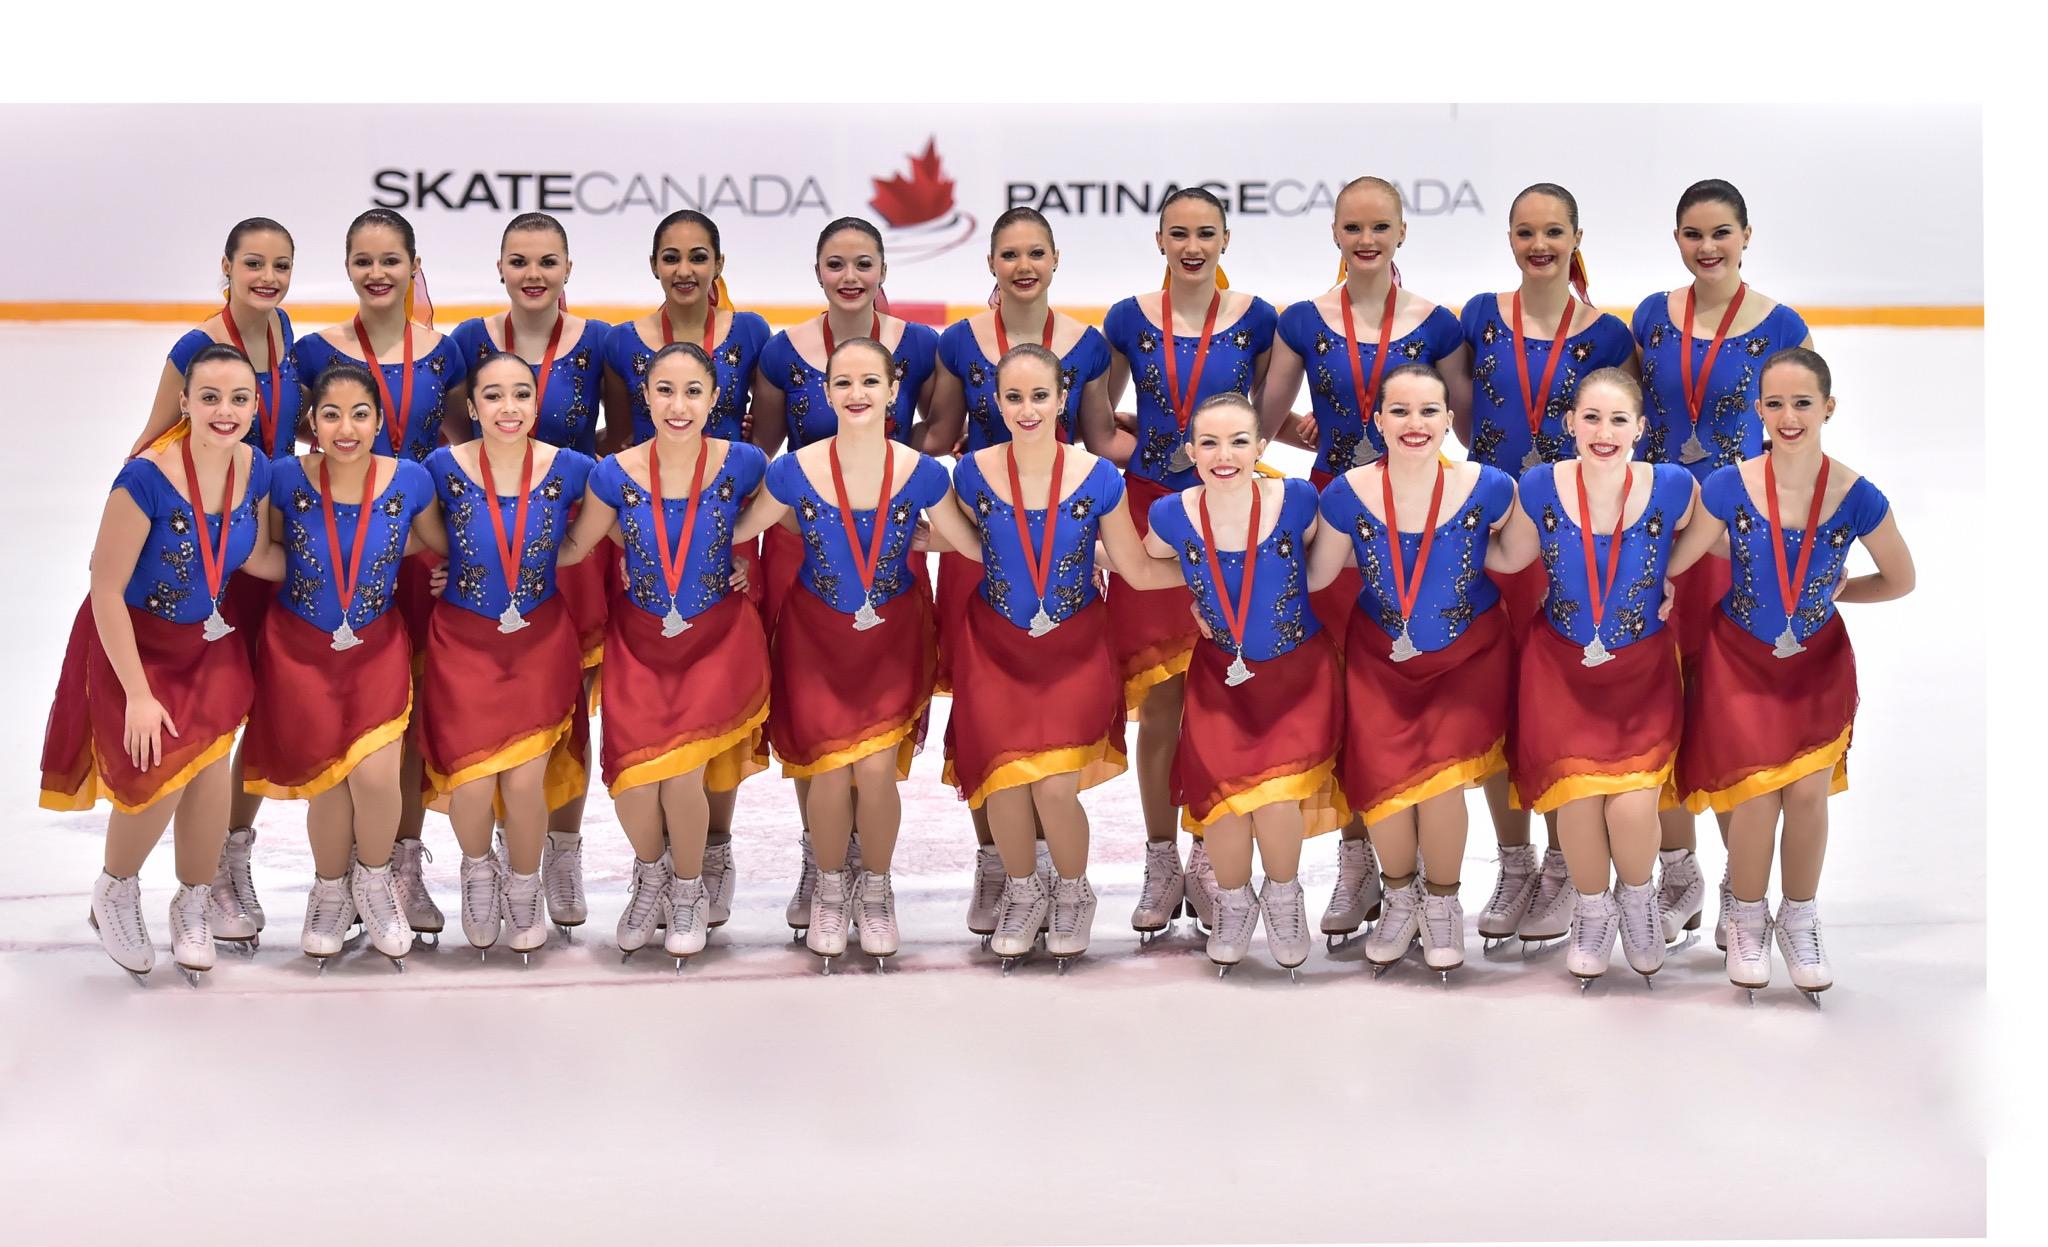 NEXXICE Novice 2015-2016 Canadian Silver Medalist